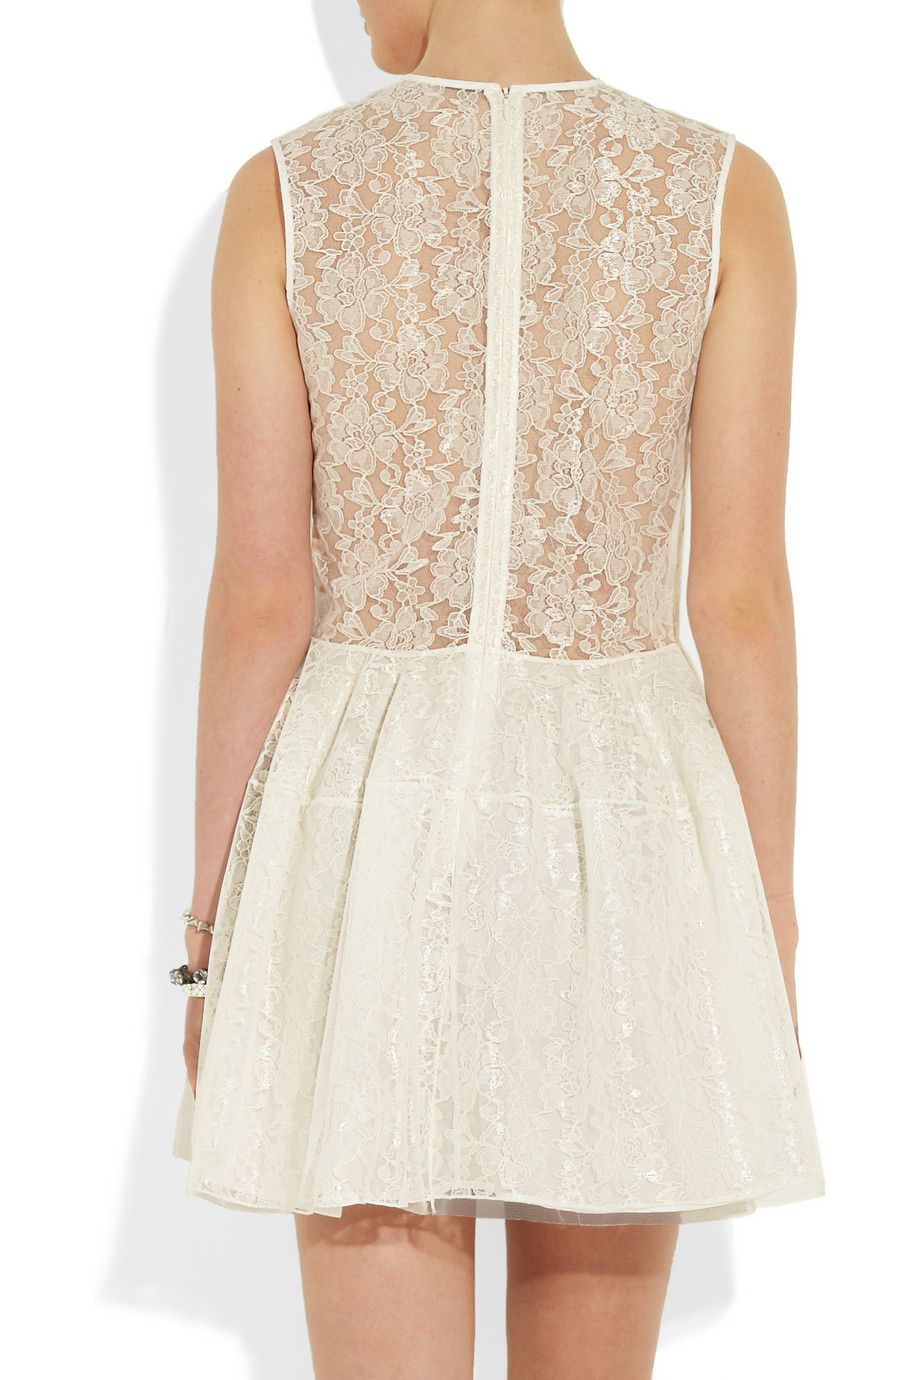 Simone Rocha Tulle and lace dress NETAPORTERCOM Wish List